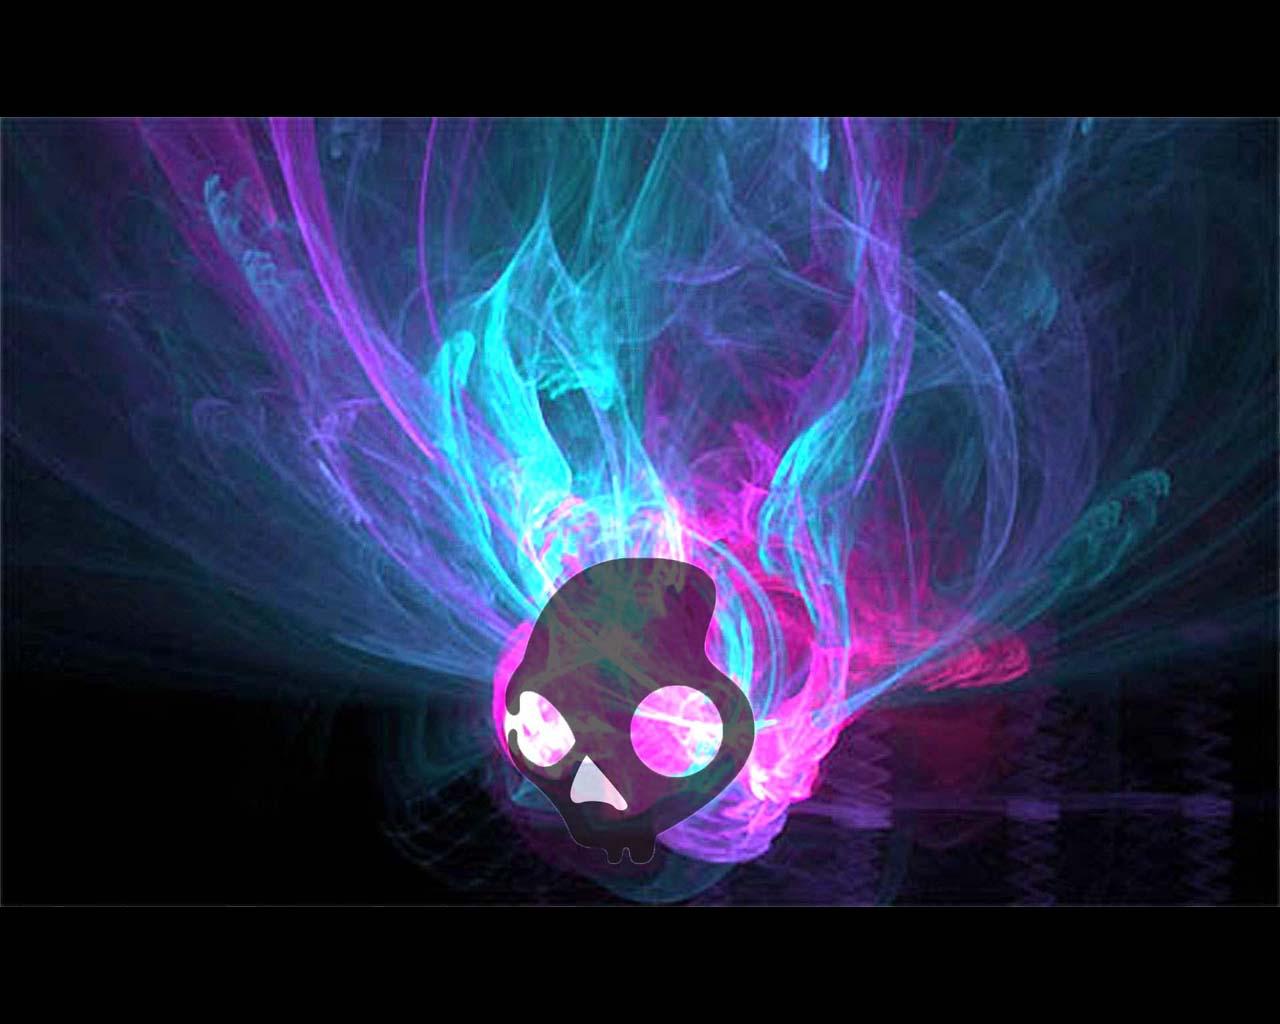 Free download Wallpaper SkullCandy Taringa [1280x1024] for